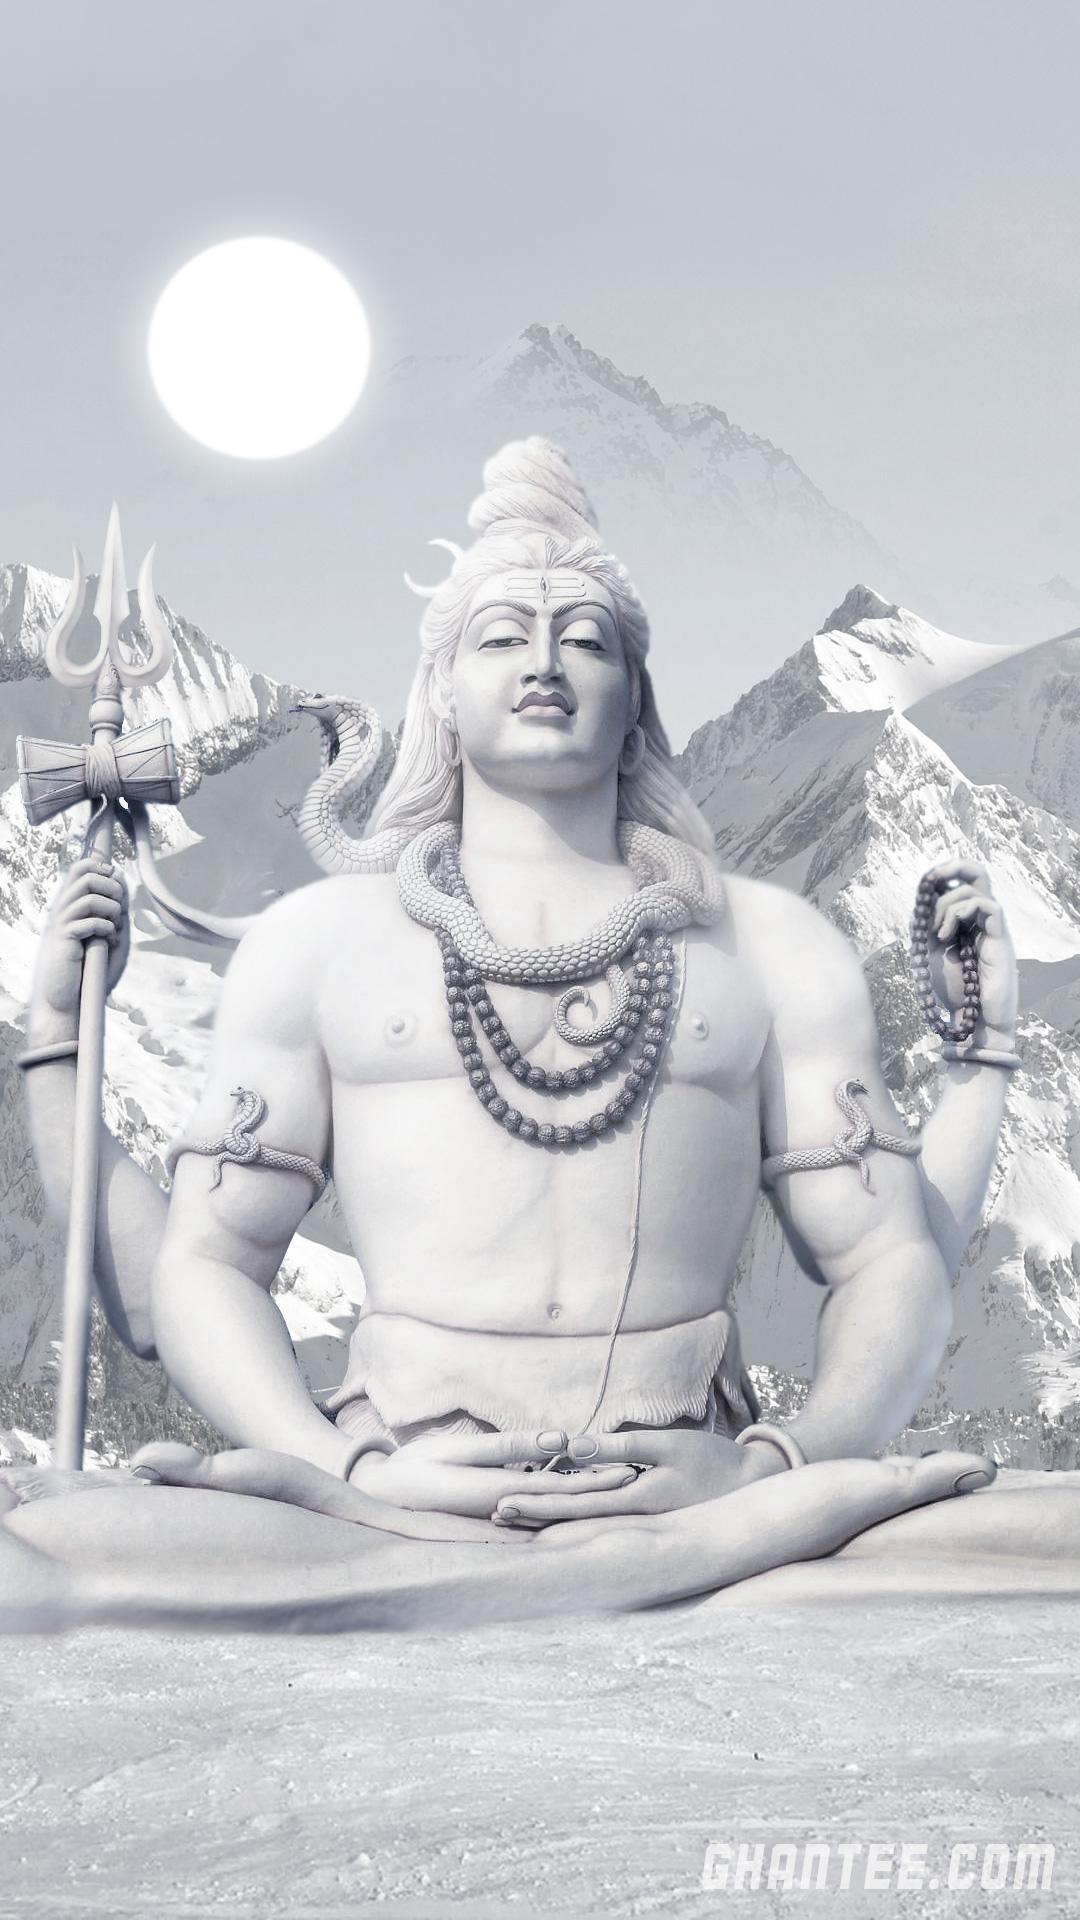 lord shiva snow mountain hd phone wallpaper